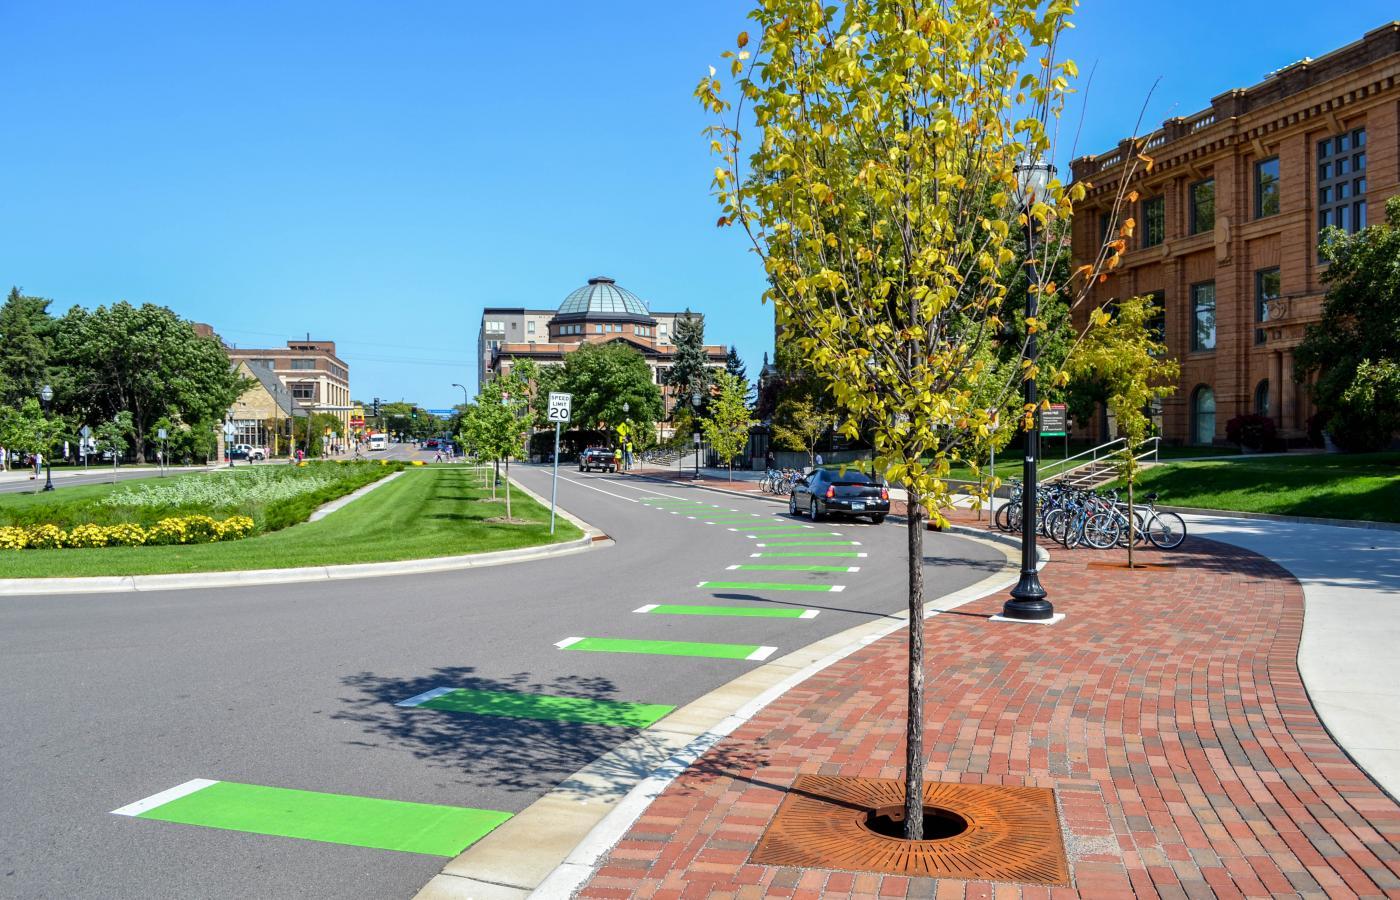 University of Minnesota Pleasant Street - 2